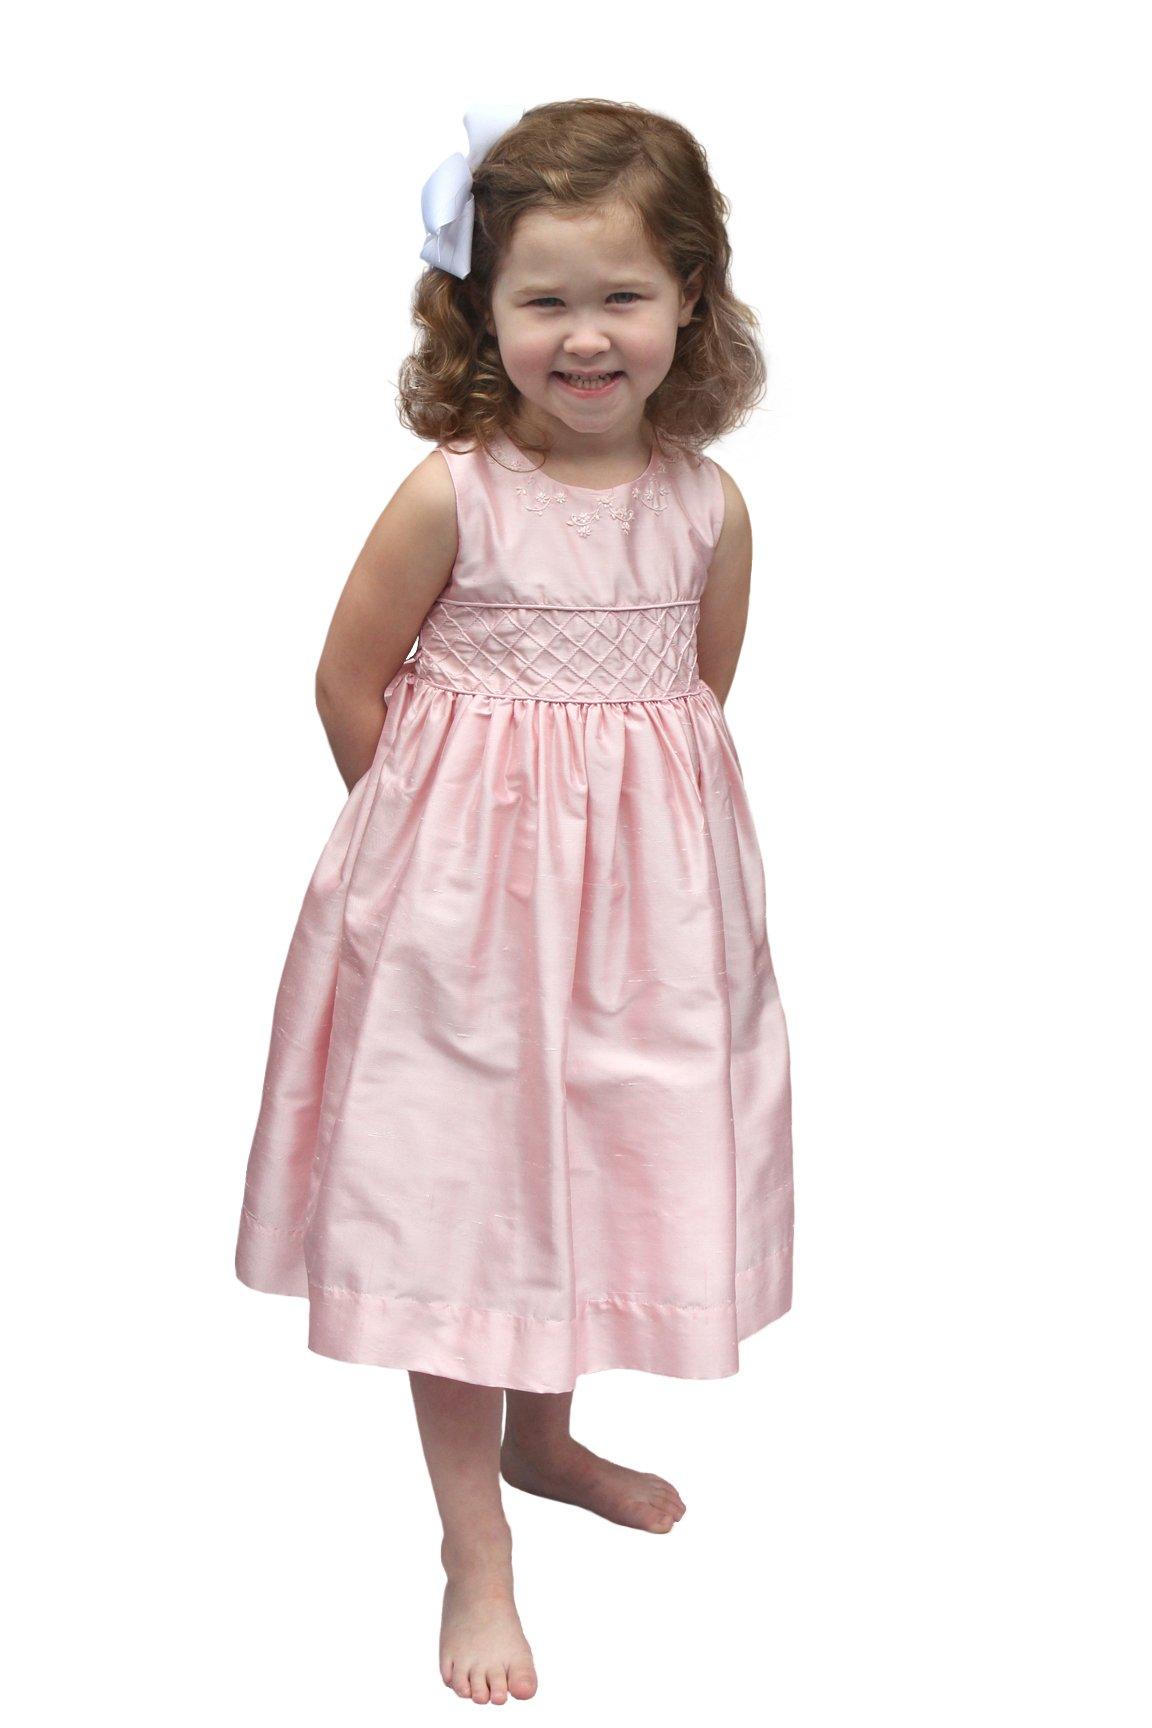 Strasburg Children Pink Flower Girl Dress 100% dupioni Silk Girls Designer Dresses Party Pageant (6)